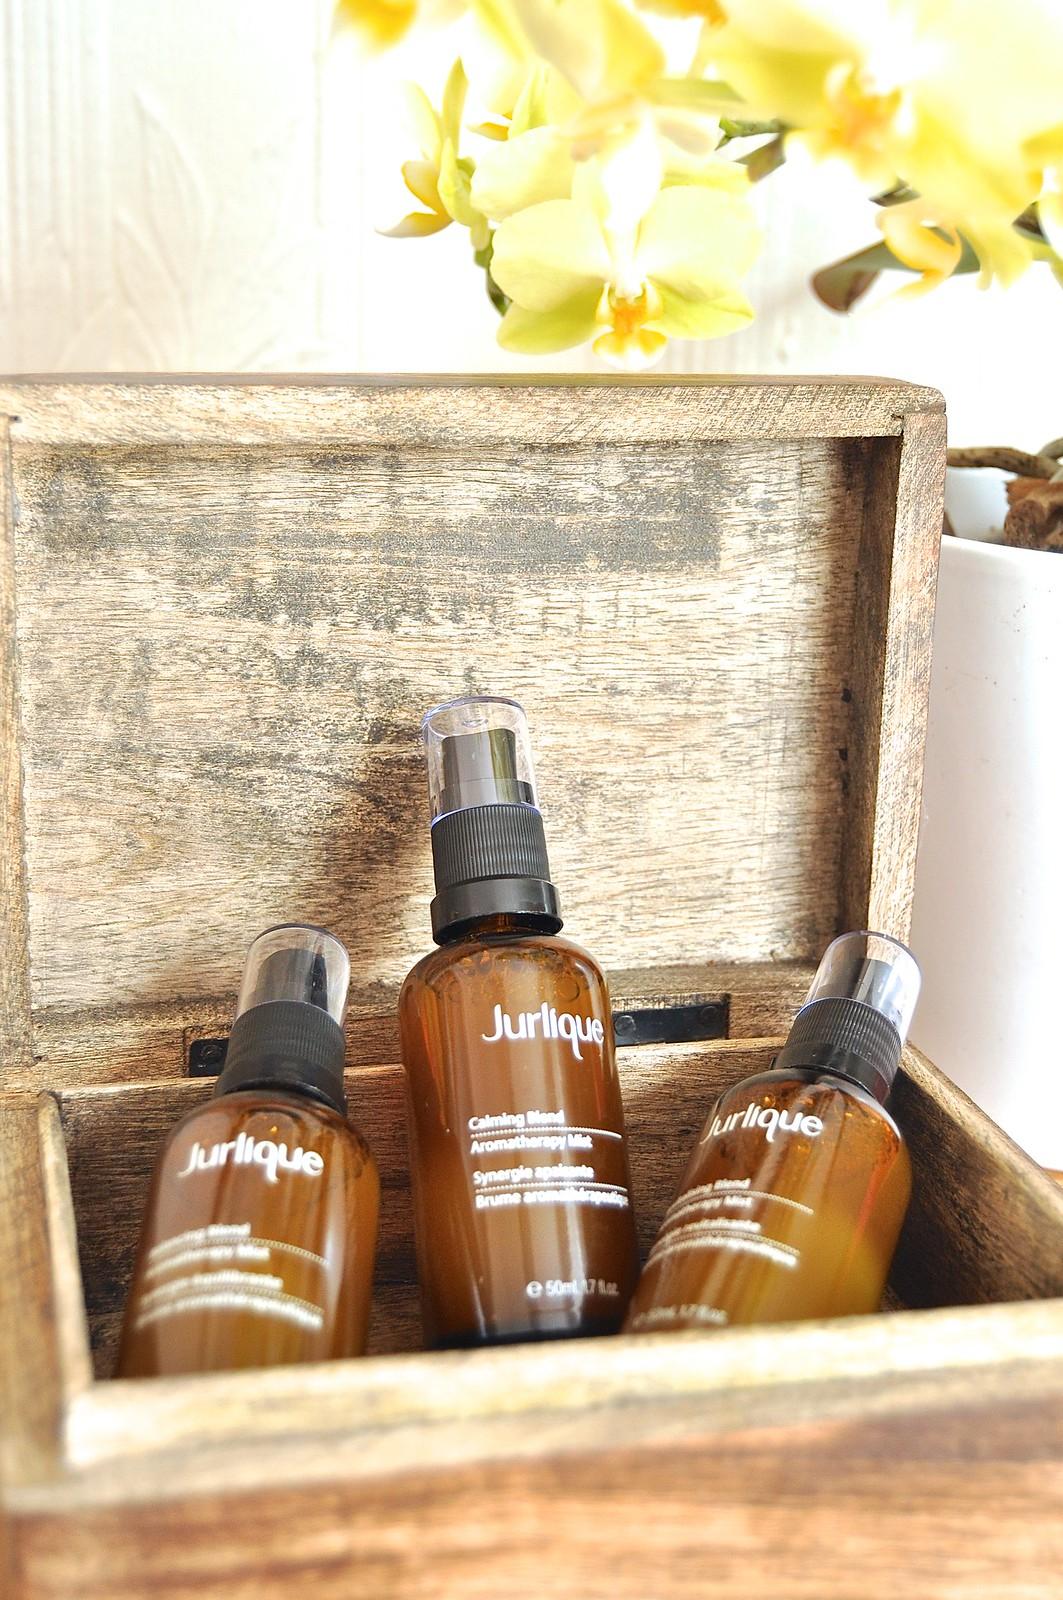 Jurlique Aromatherapy Mists 1